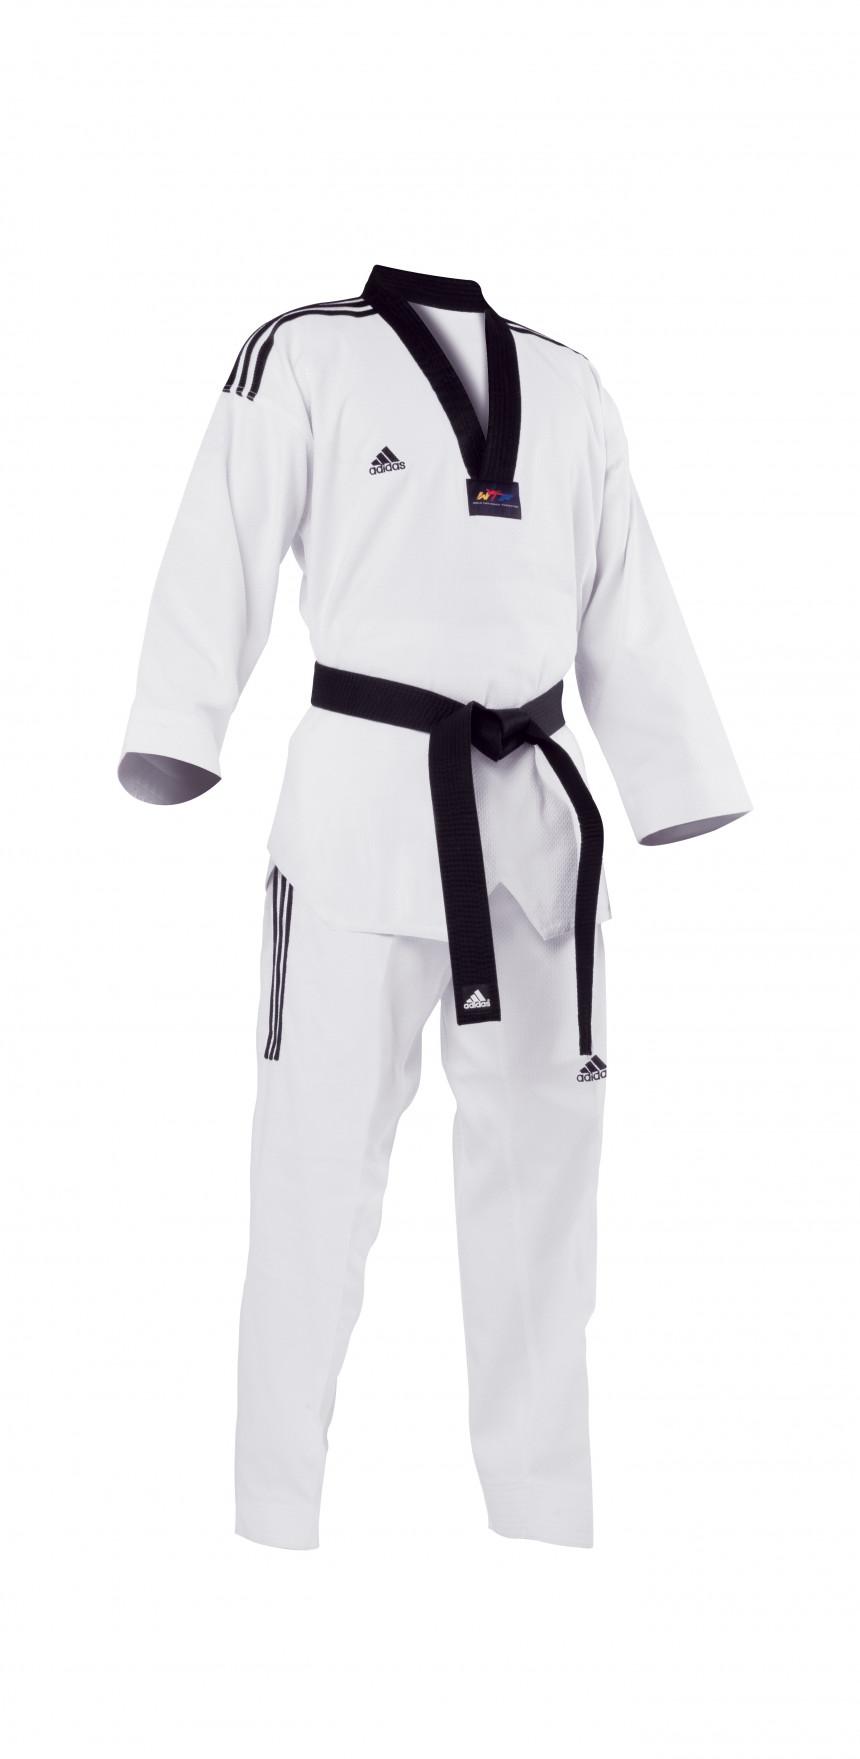 f89c01c7034 Adidas Grand Master Taekwondo Pak - Zwarte Kraag kopen - Justathlete.nl